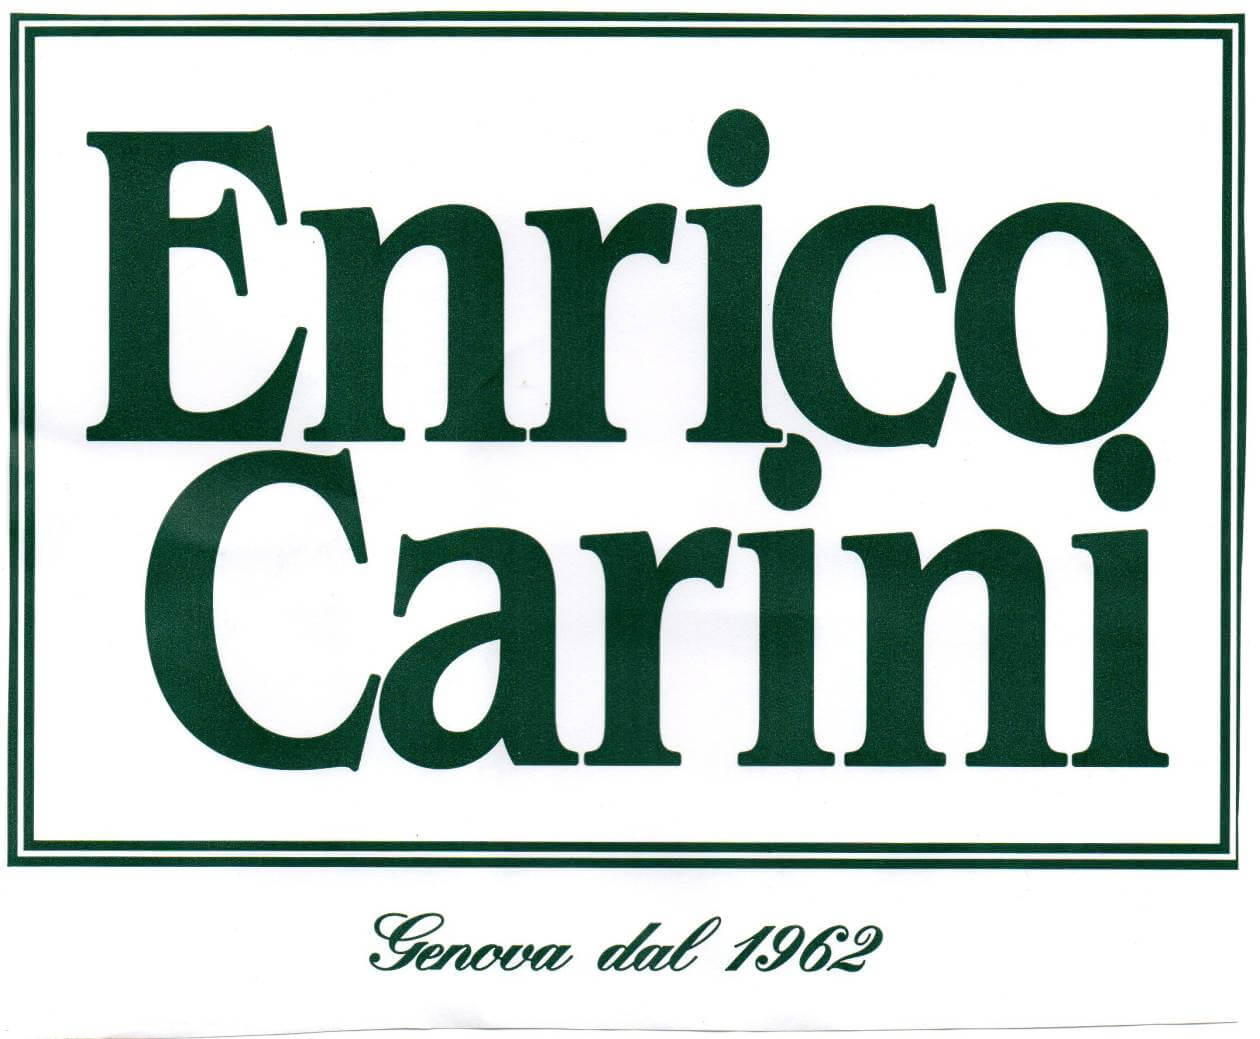 Enrico Carini